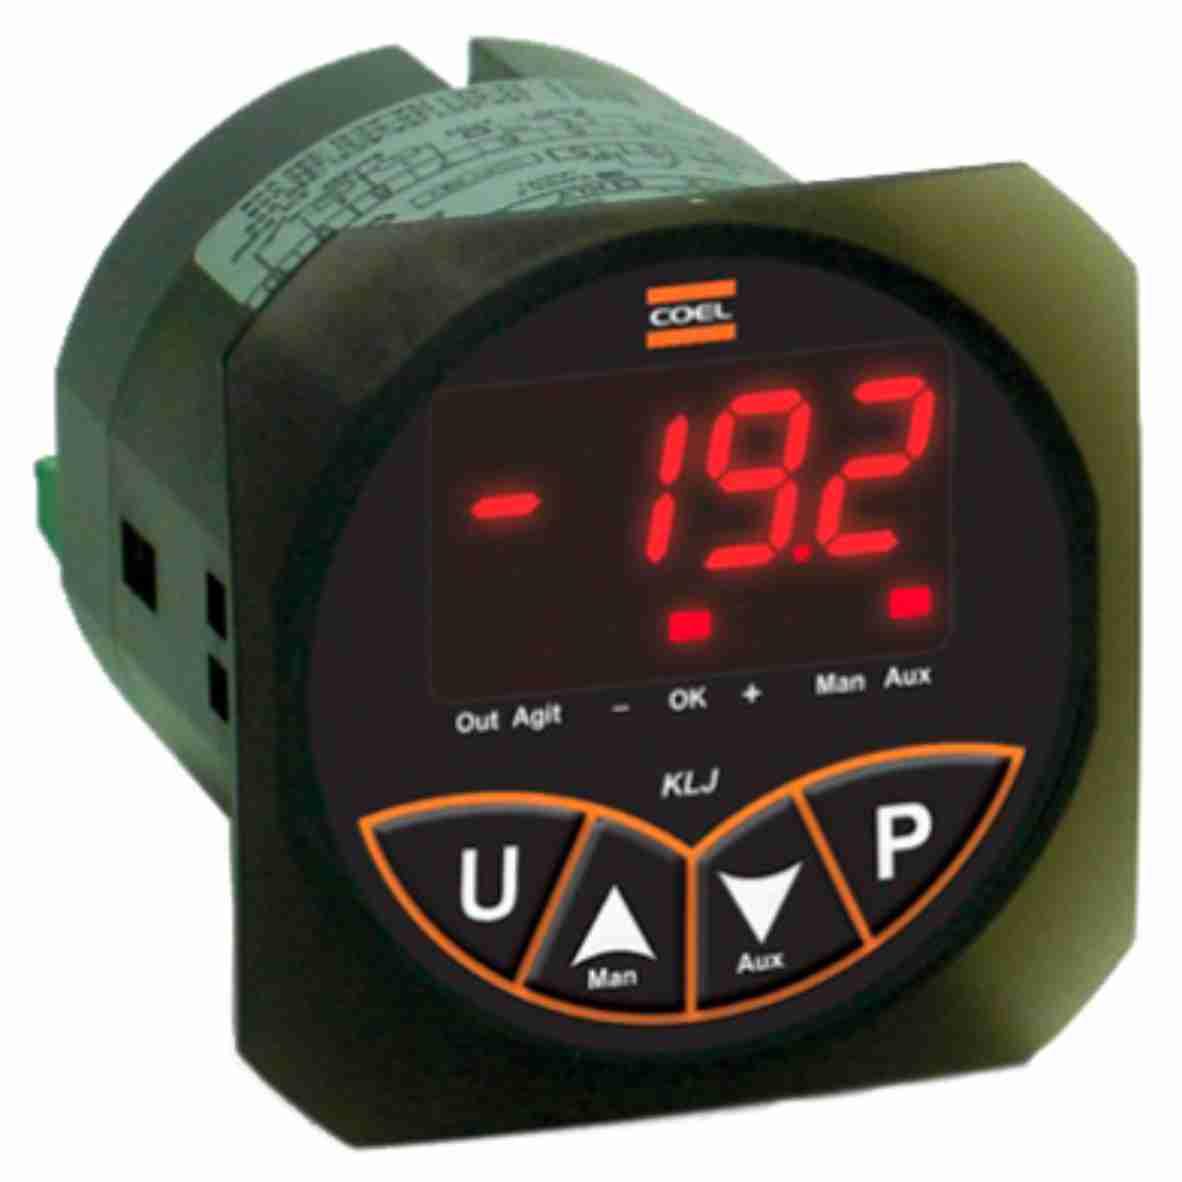 Termômetro Coel Leite KLJ 29 110/220V